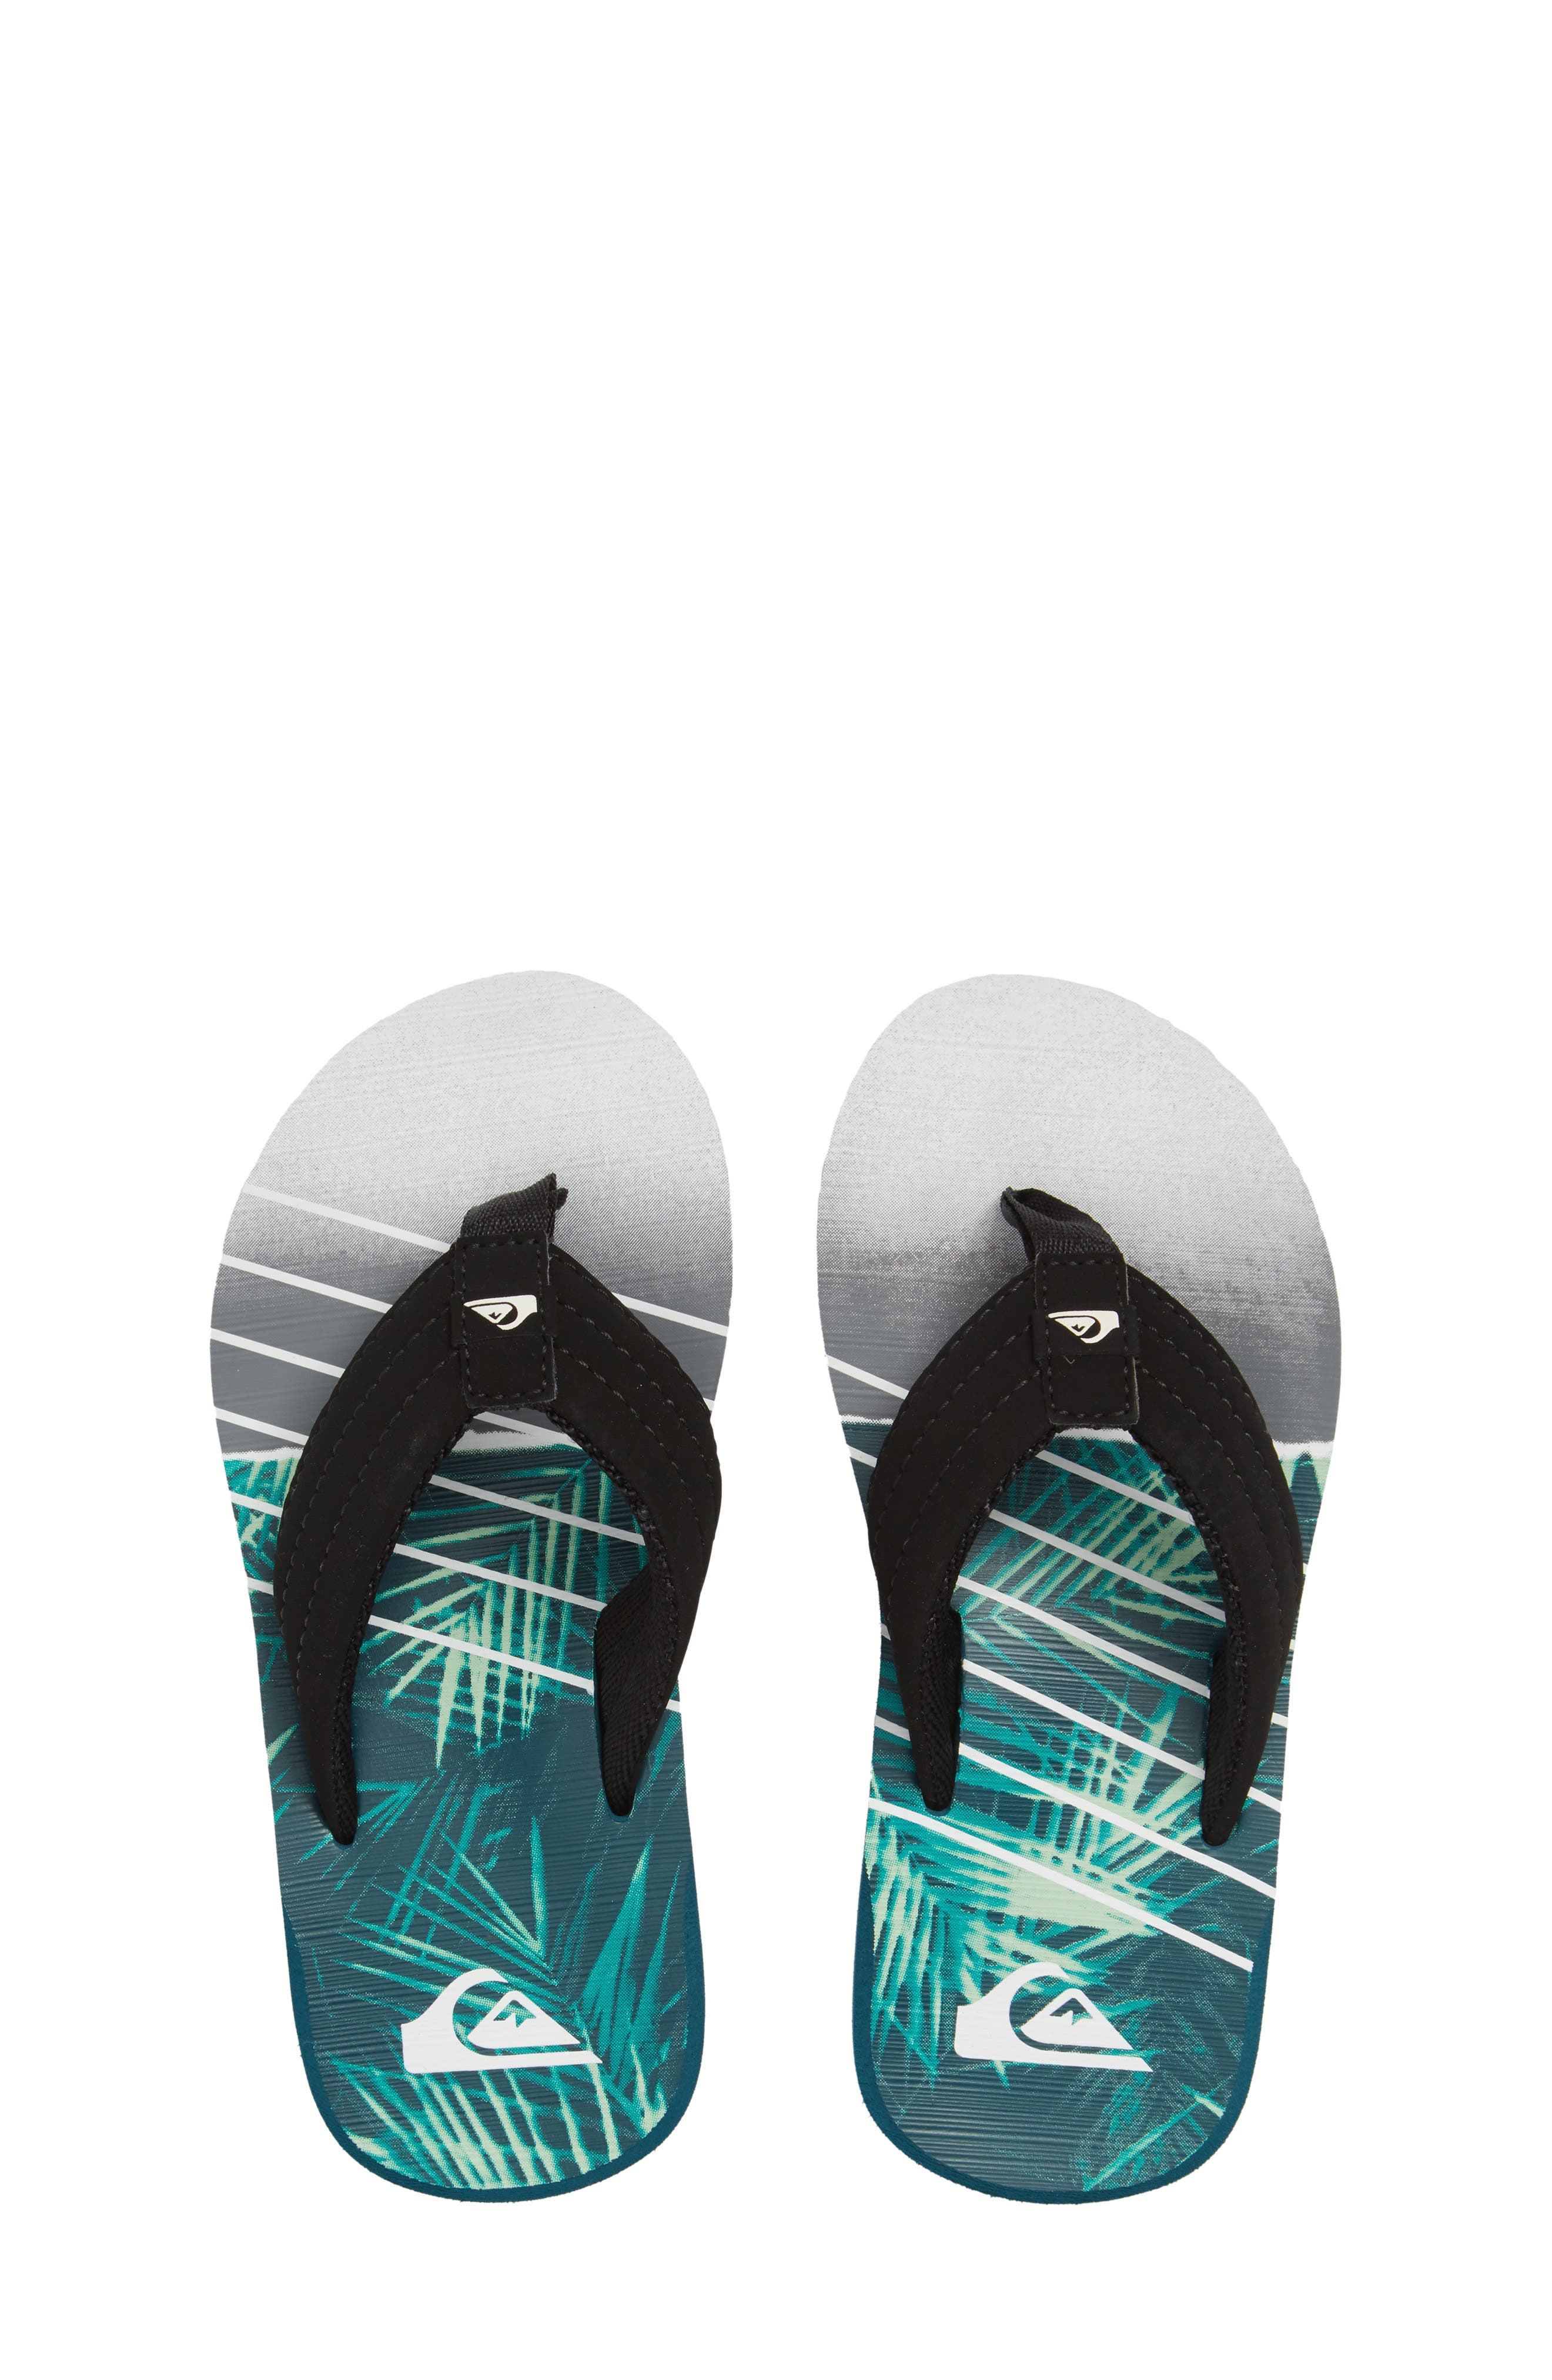 Carver Flip Flop,                             Main thumbnail 1, color,                             Black/ Green